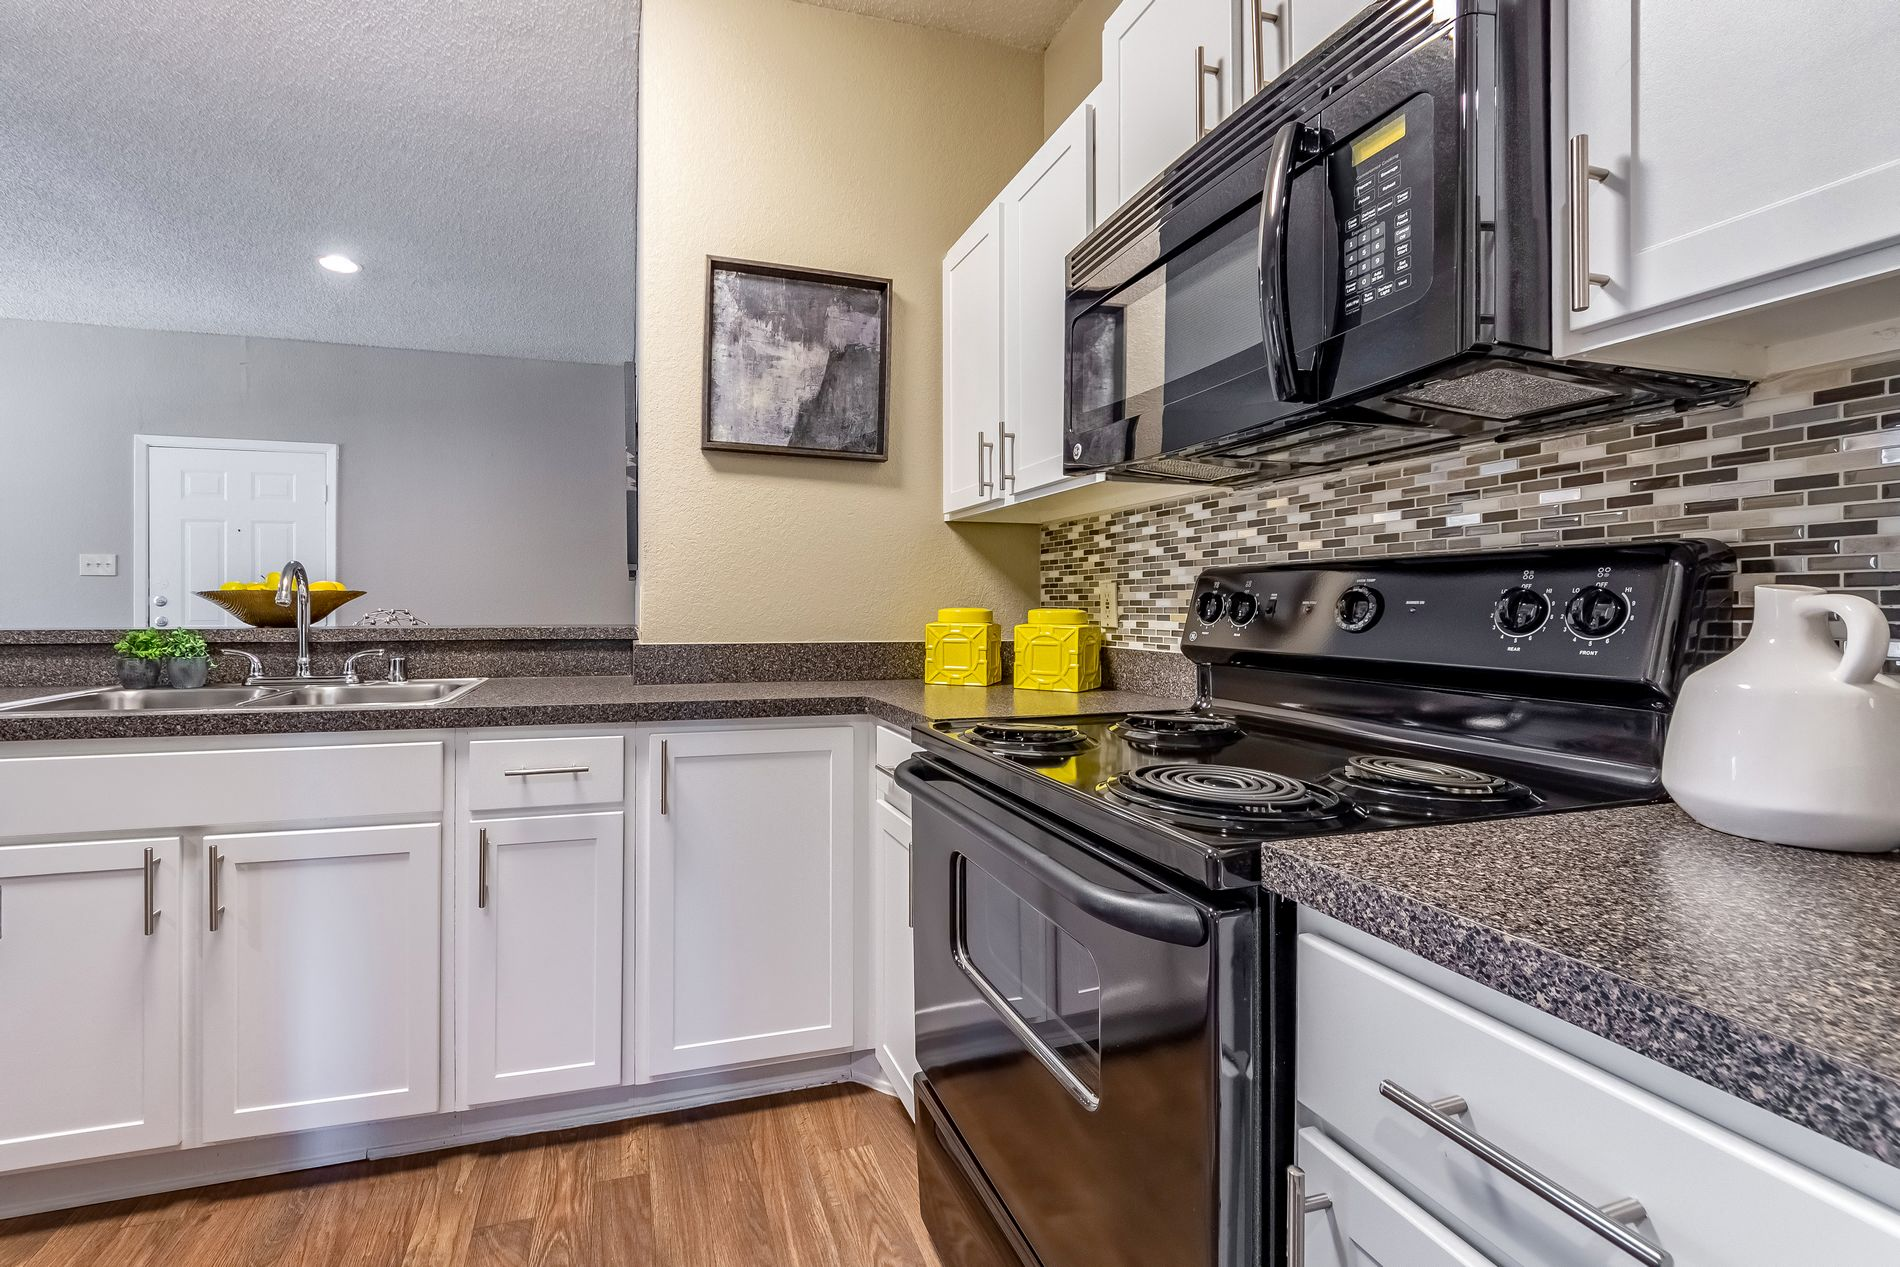 Model Black Kitchen Appliances at La Costa Apartments in Plano, Texas, TX